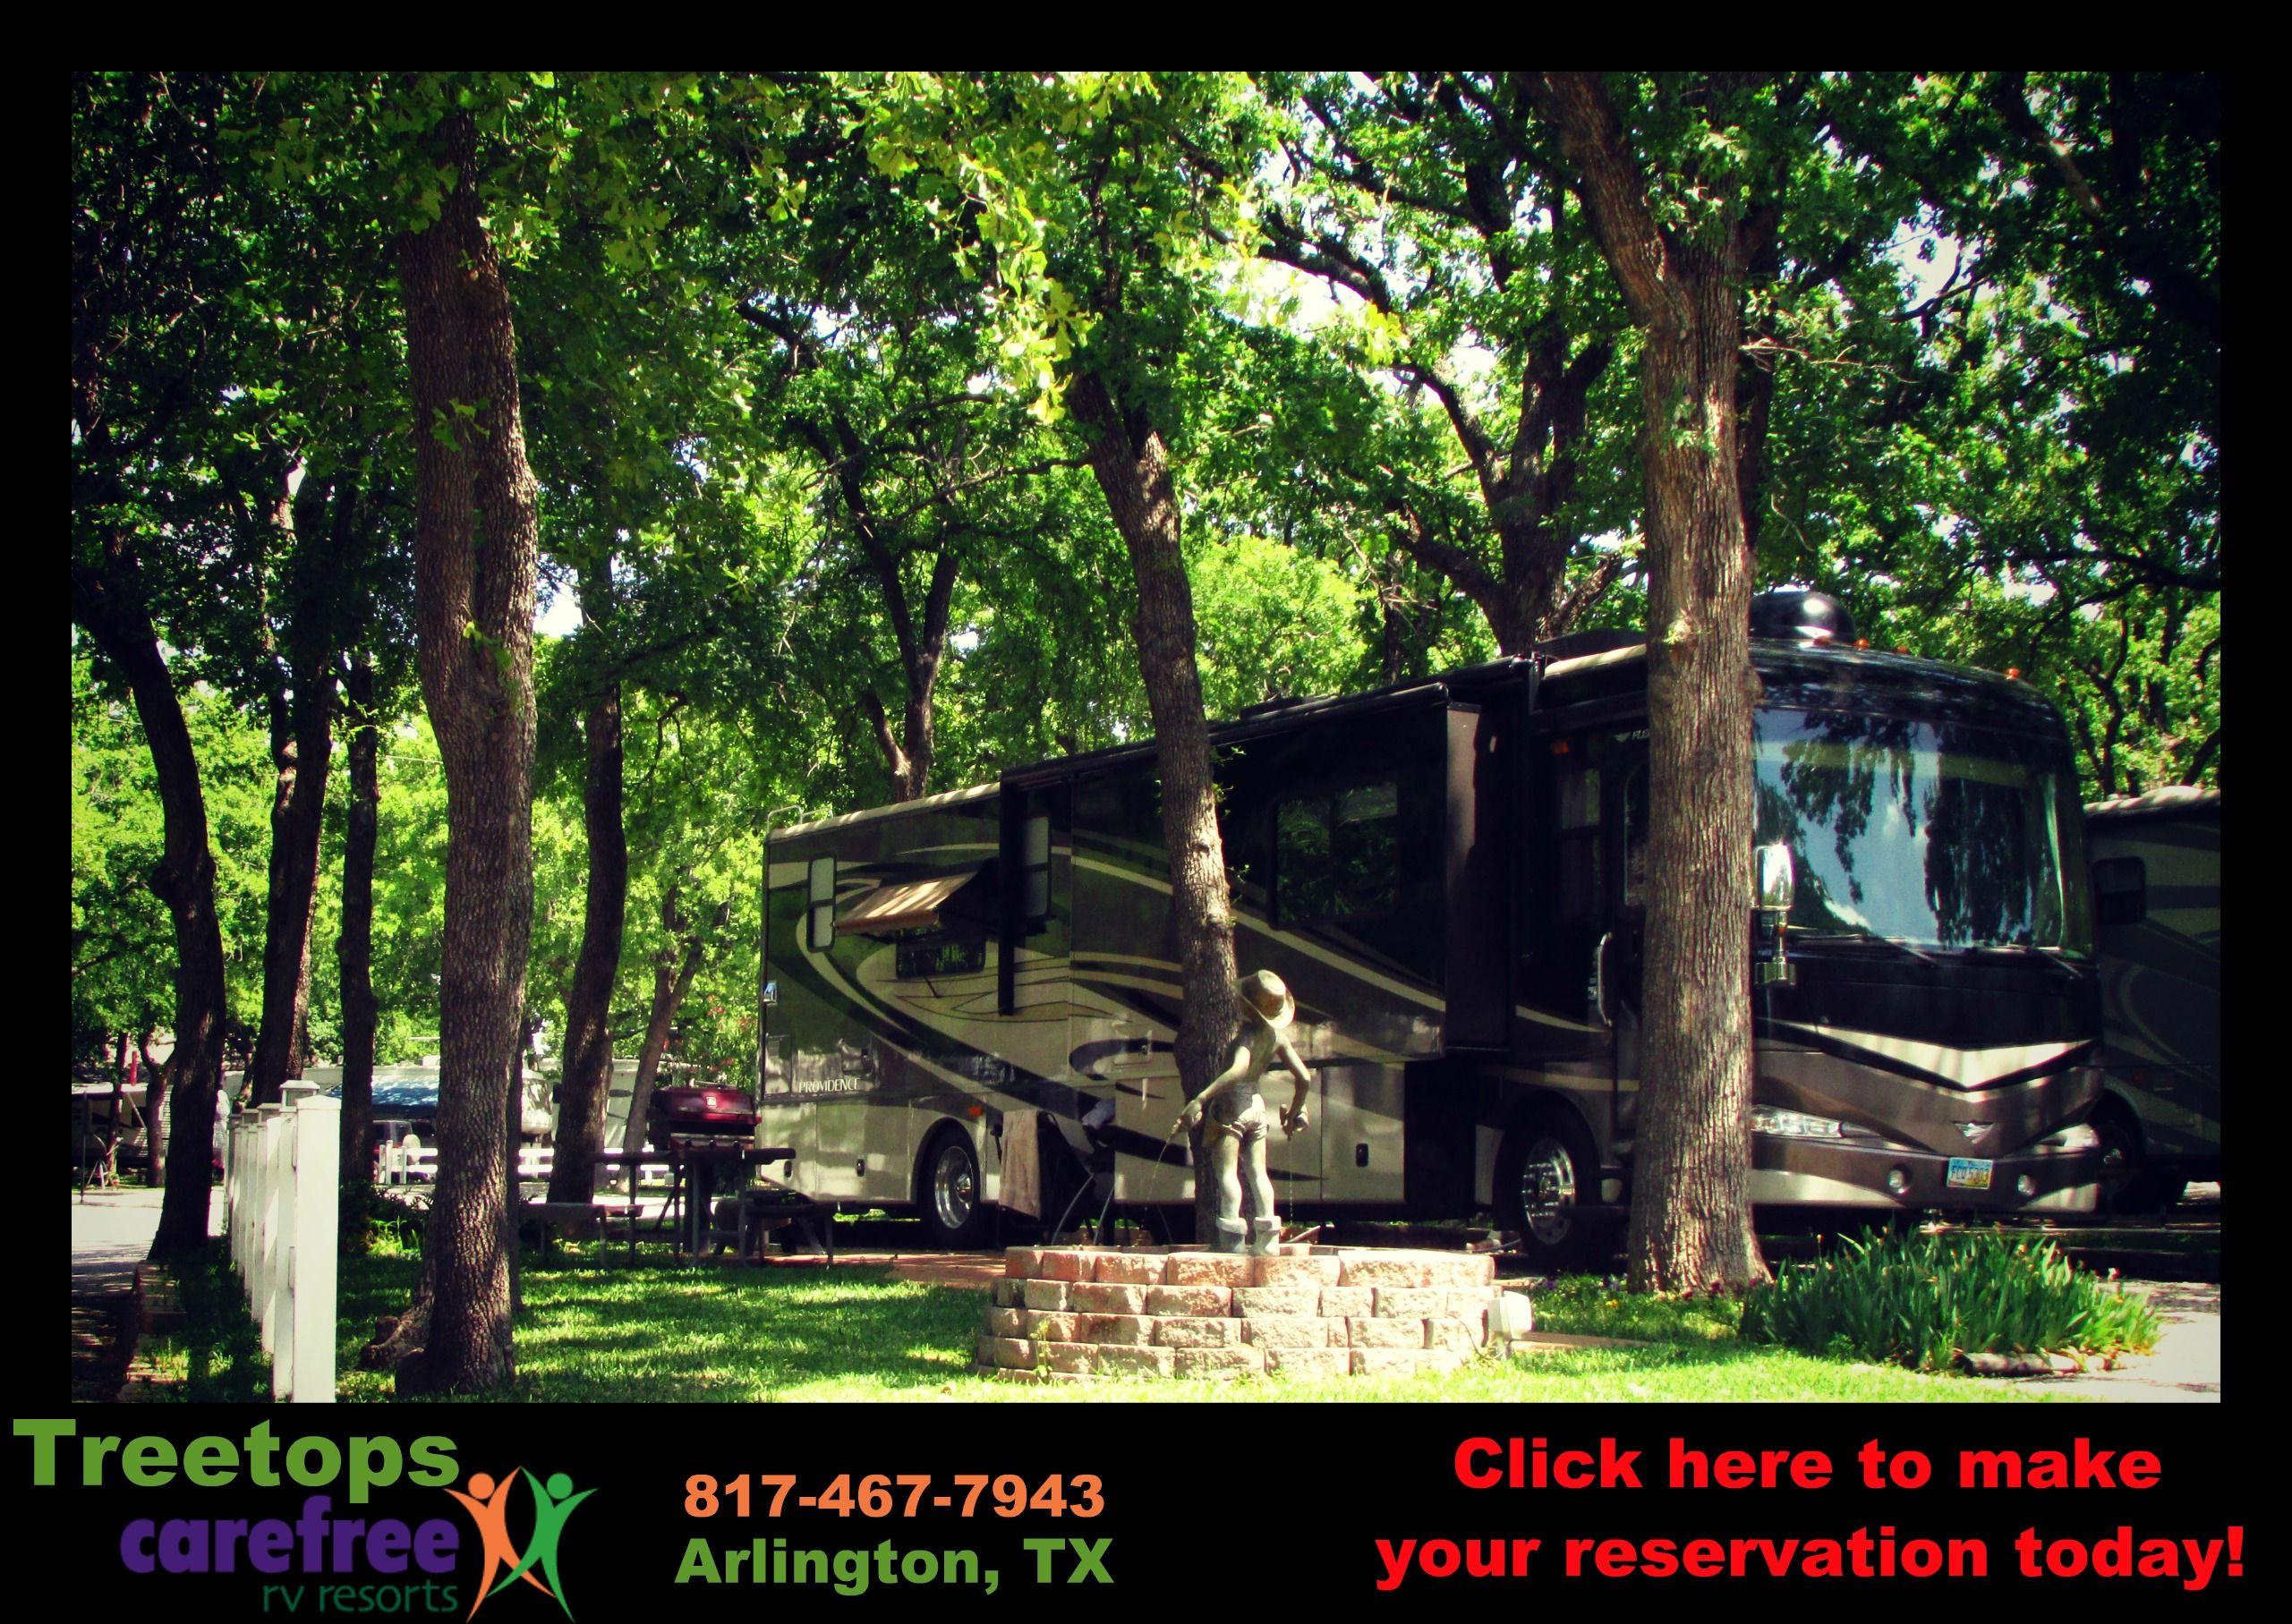 Visit Treetops Carefree Rv Resort In Arlington Tx Located